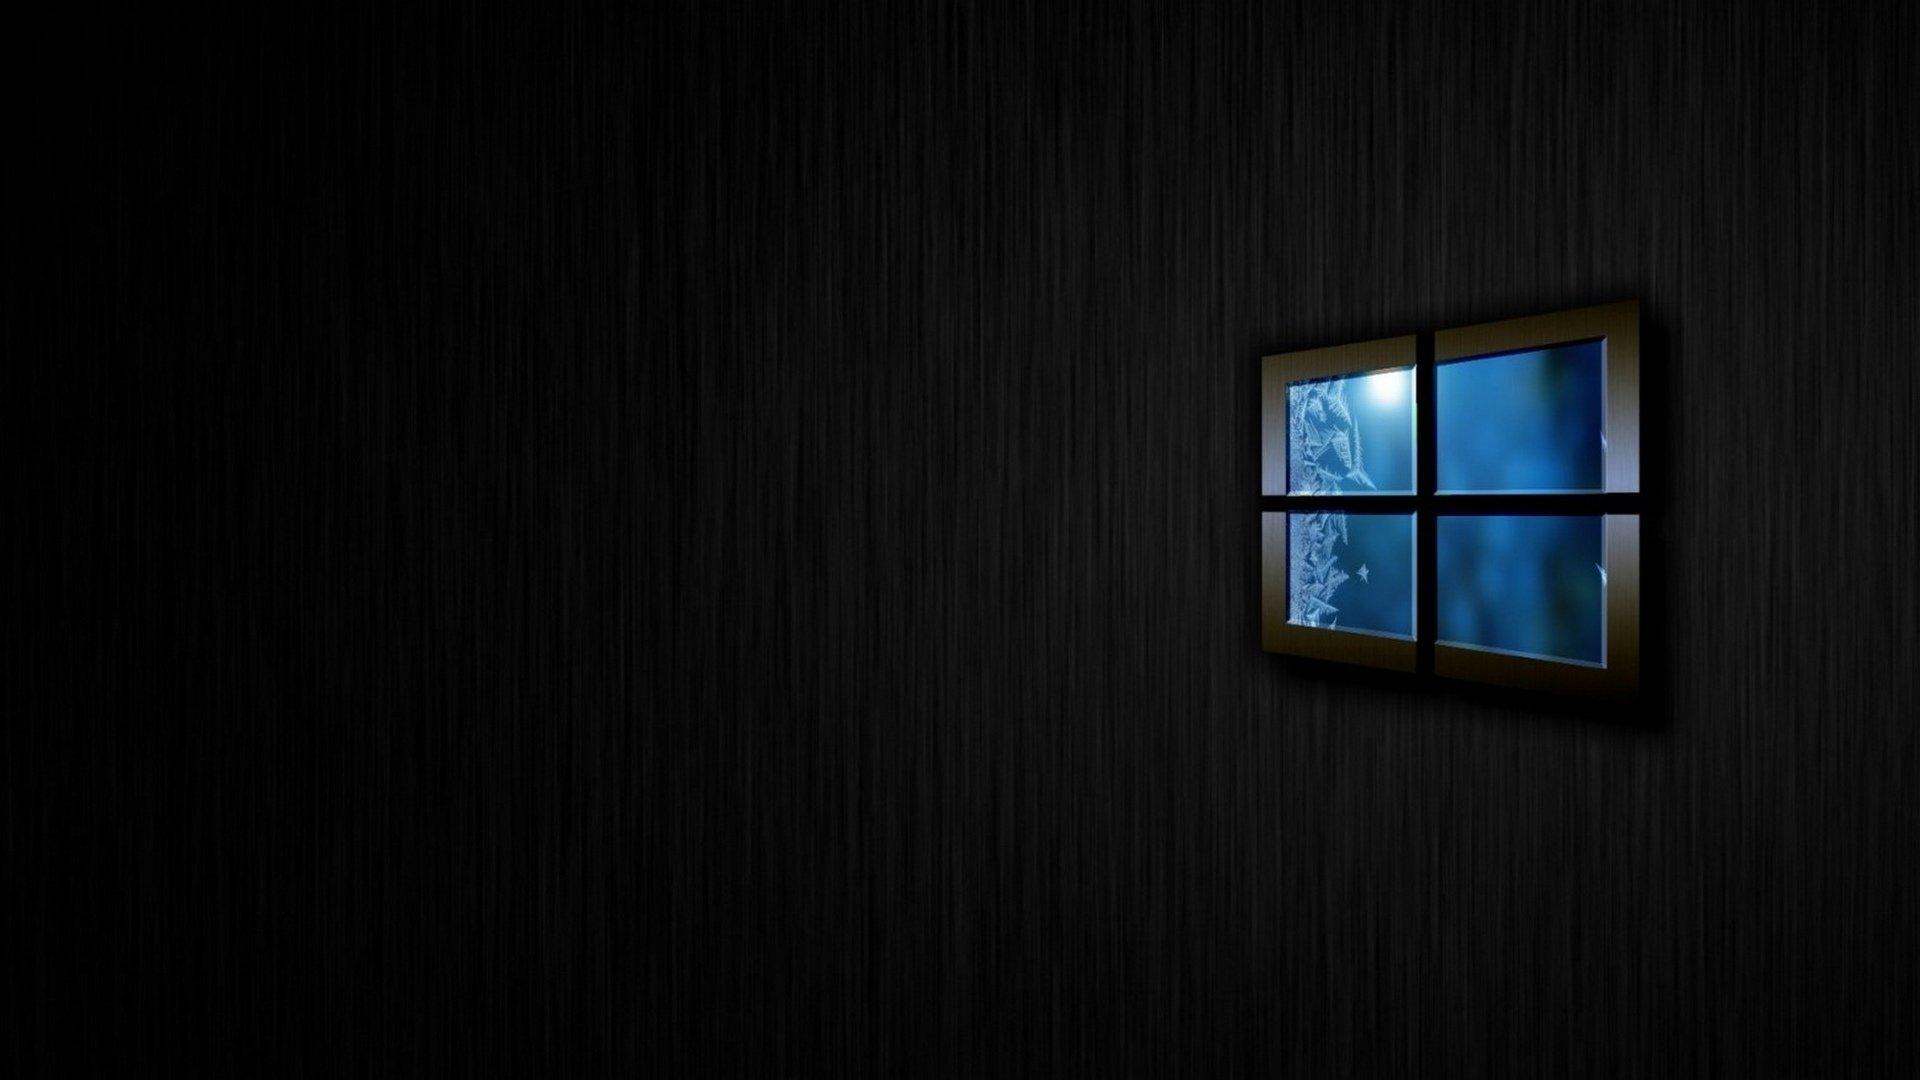 Masaüstü 1920x1080 Piksel Microsoft Windows Windows 10 1920x1080